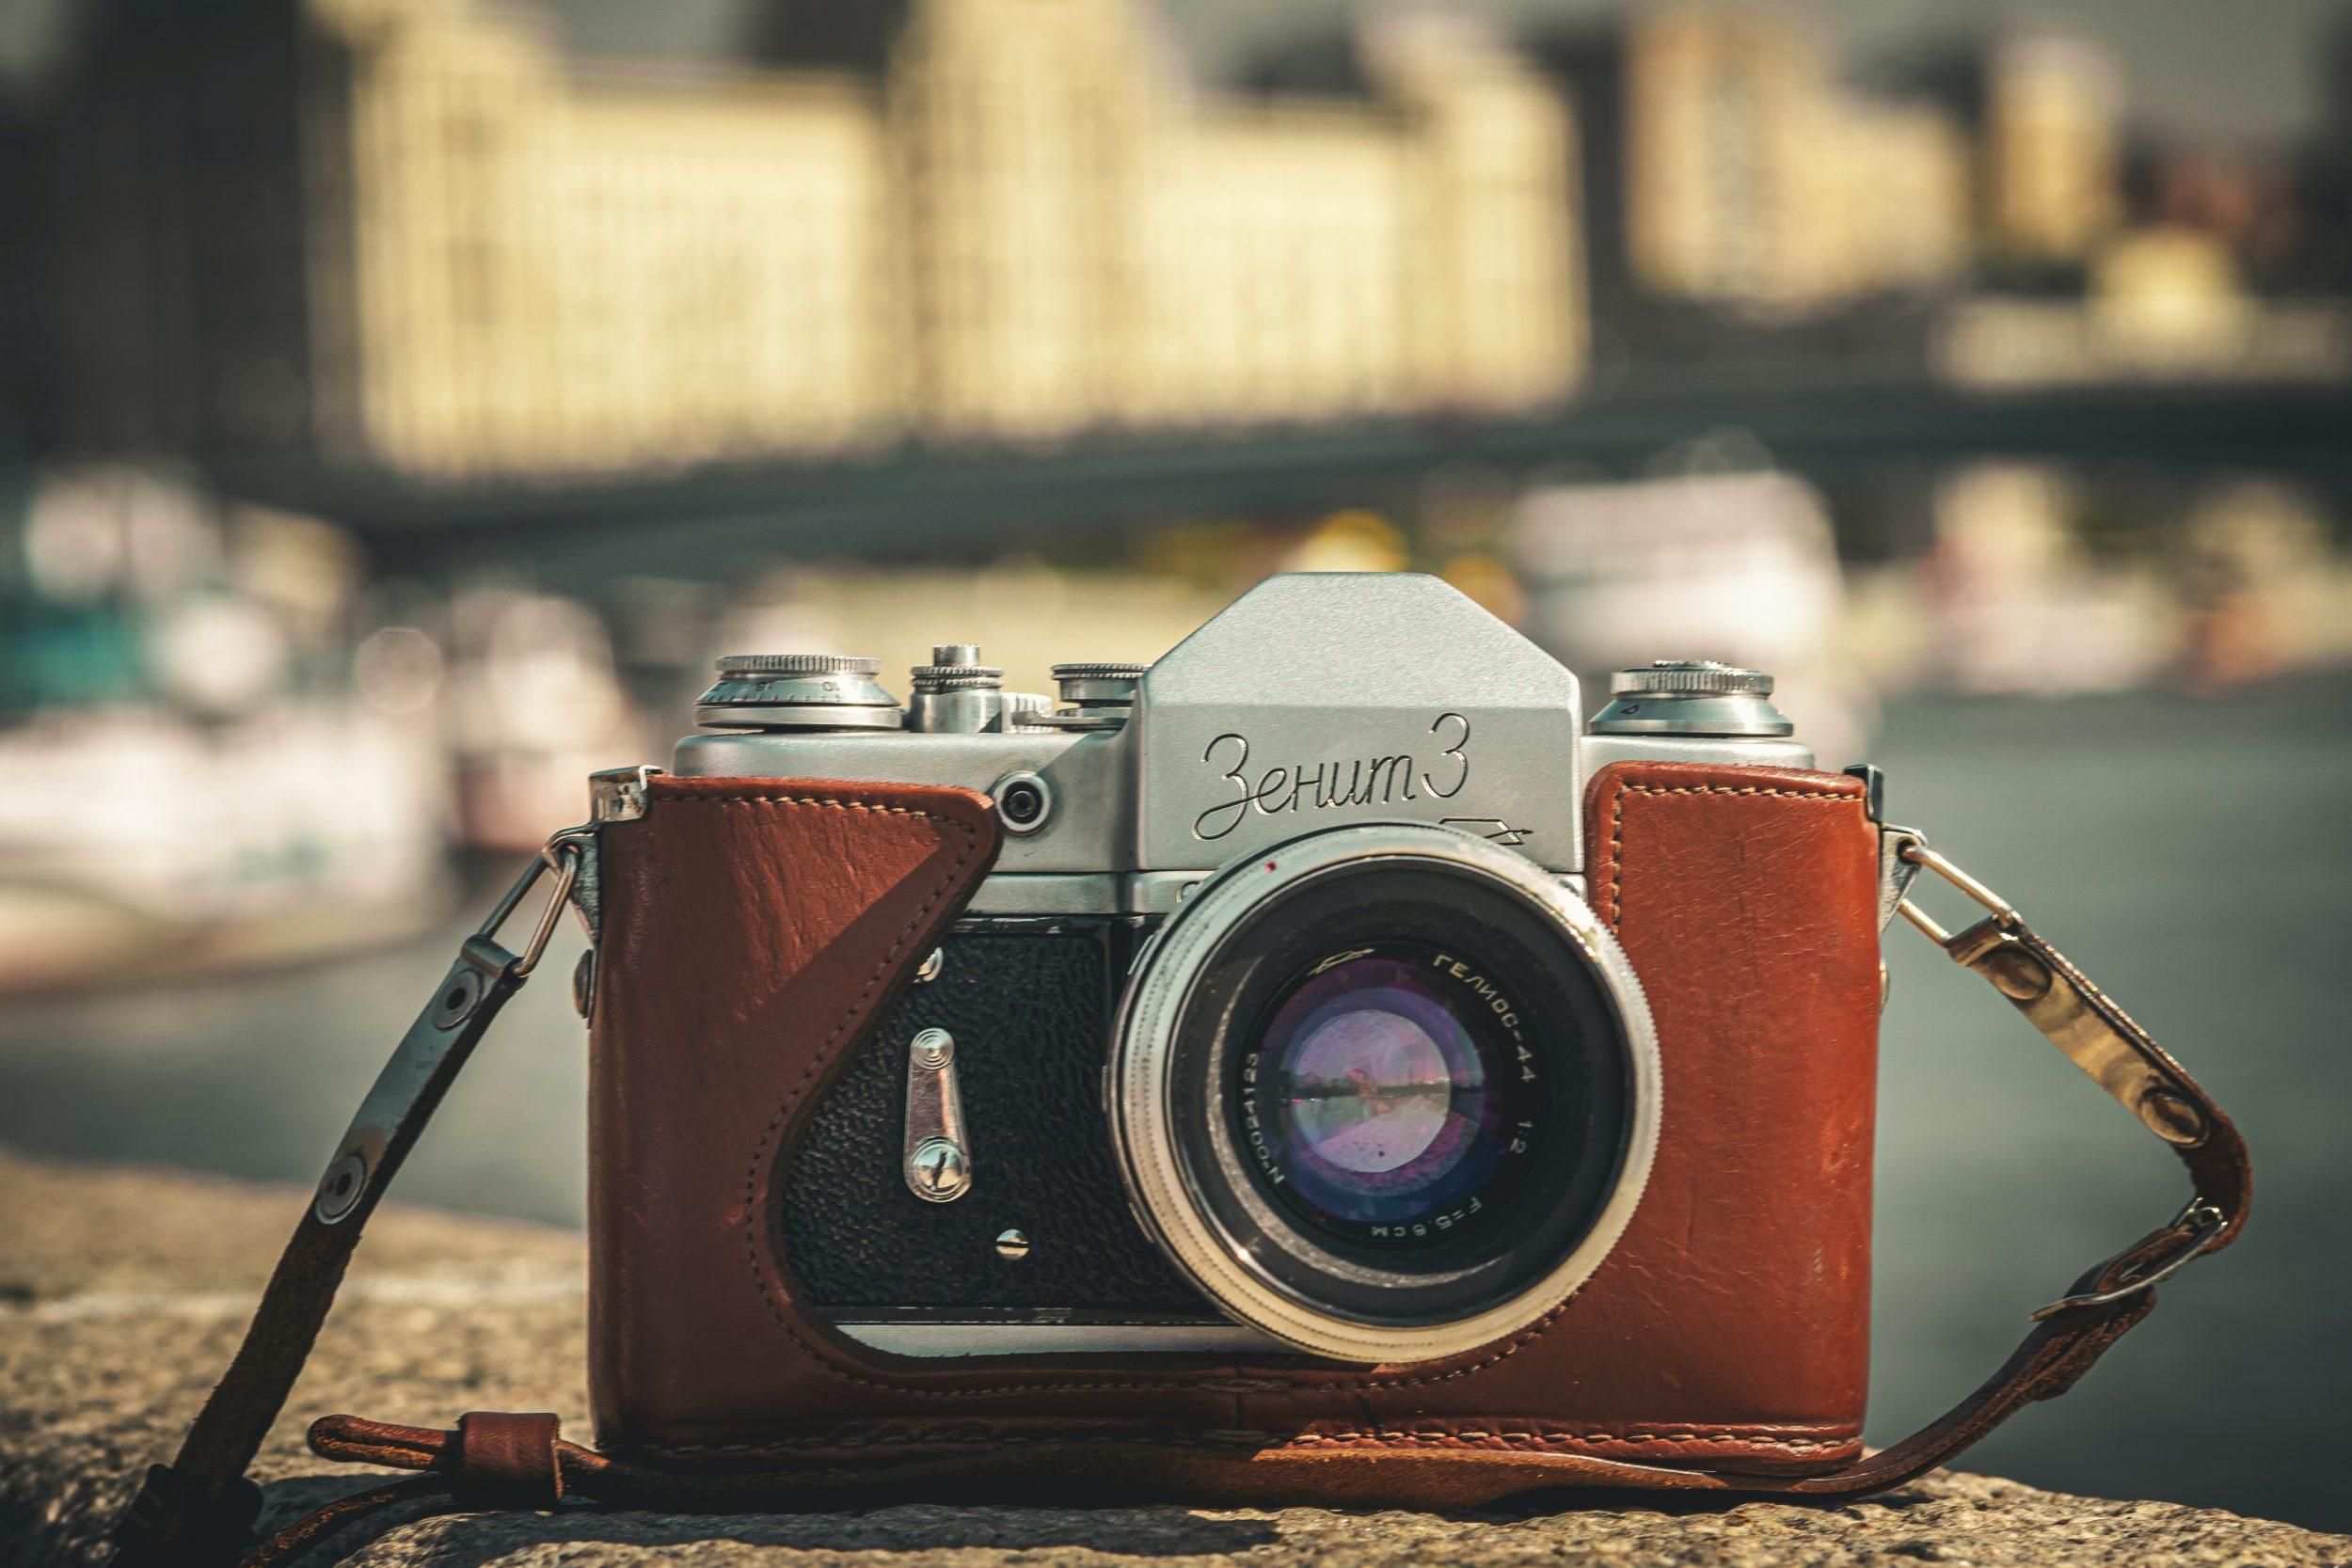 Zenit-3 camera (Pic: Artem Beliaikin/Pexels)